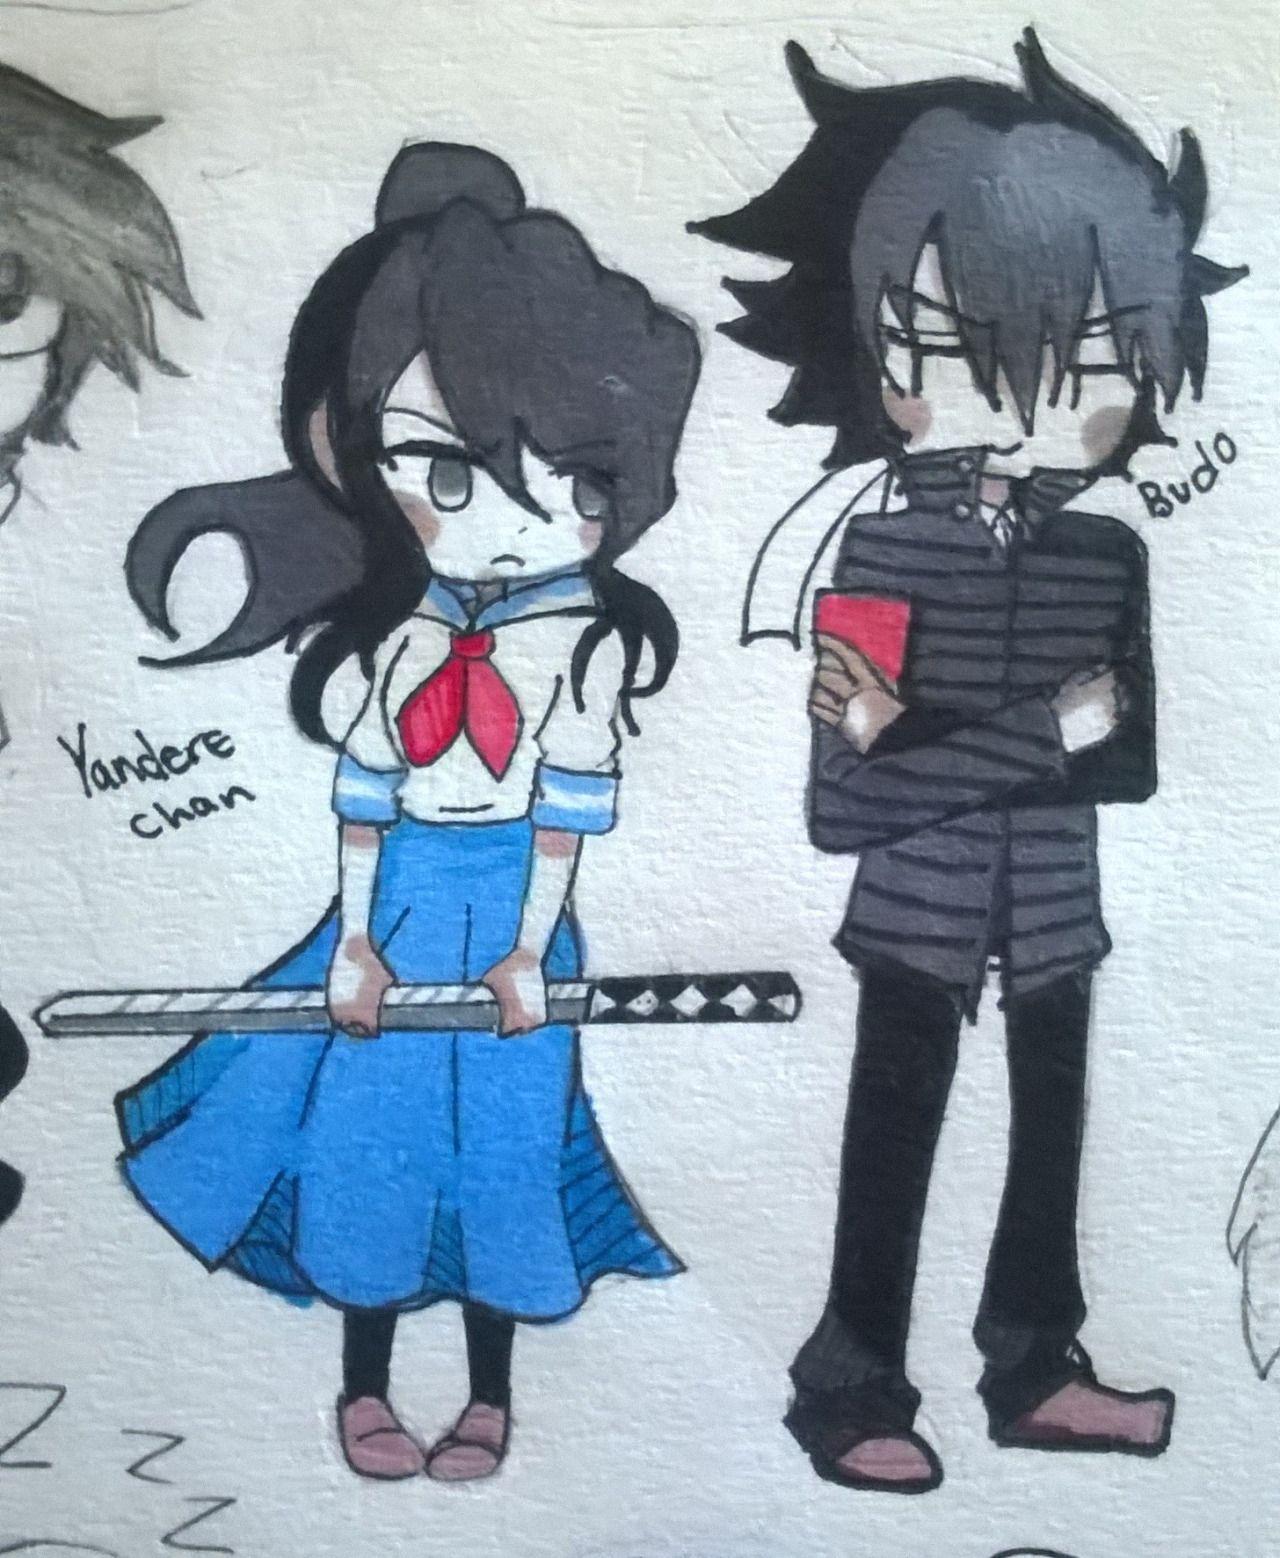 Game development blog yandere classmates anime pinterest nice - Therejectedclub Yandere Simulatoranime